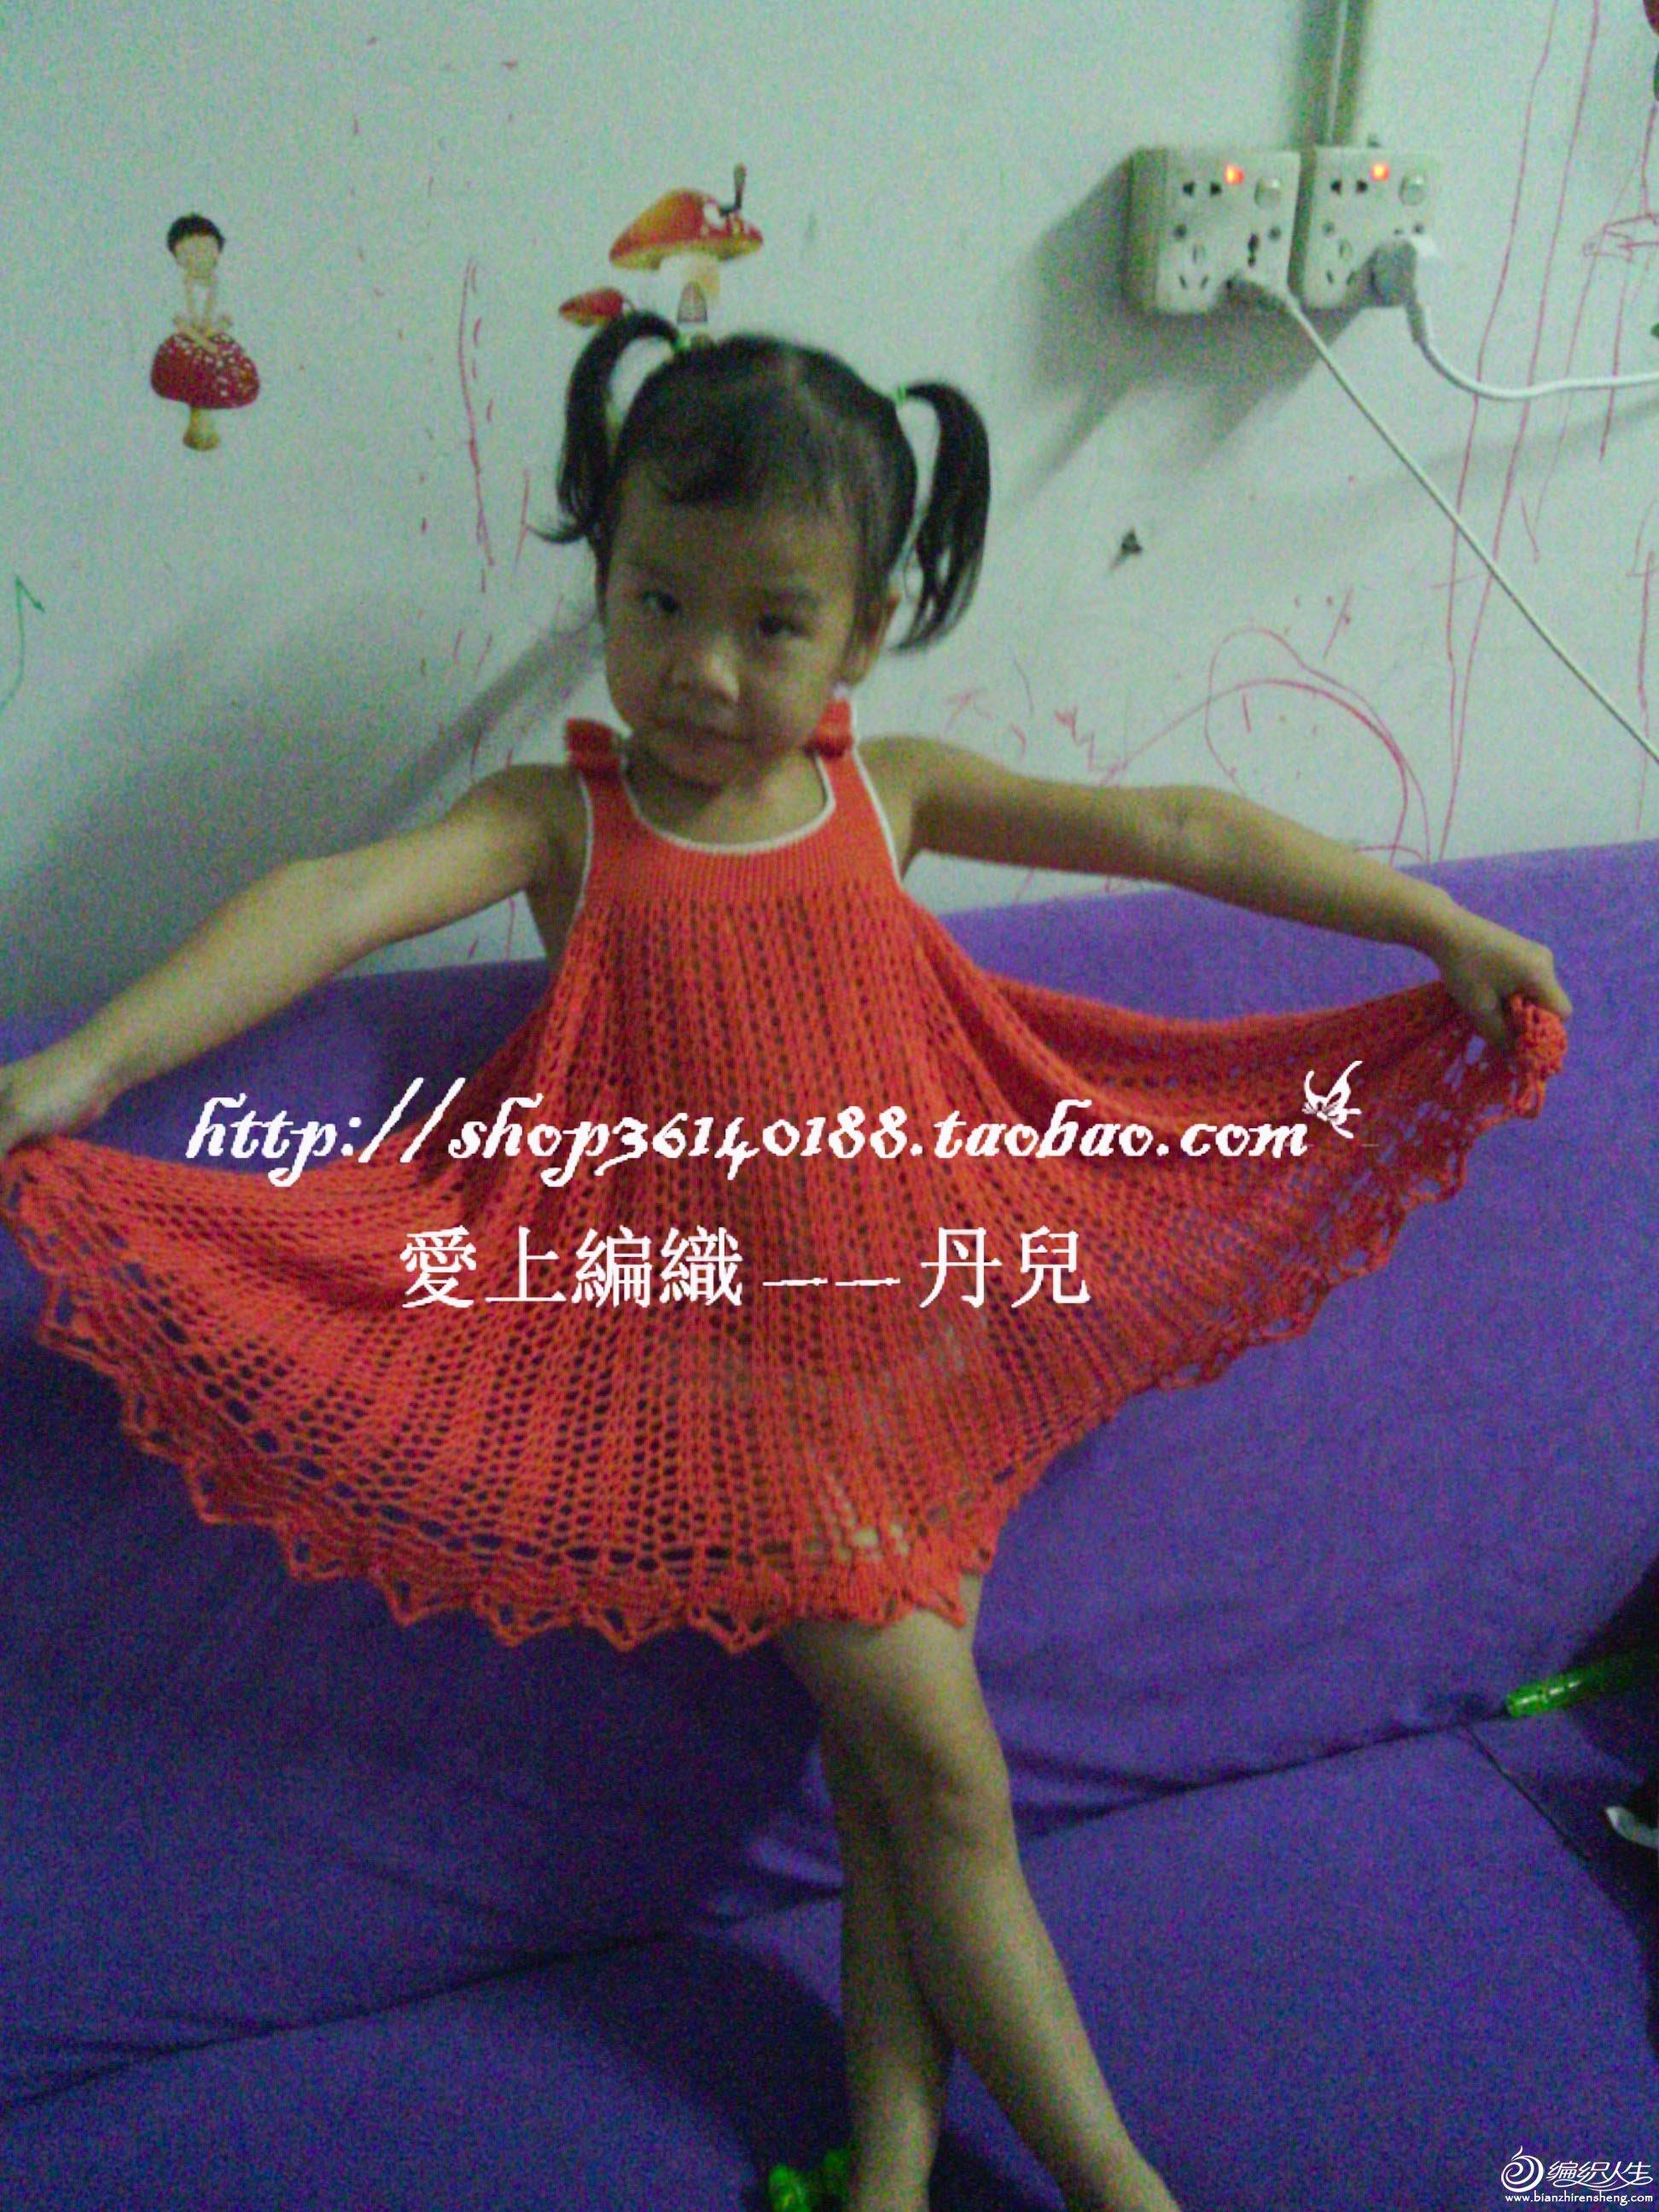 IMG_20120620_194141.jpg